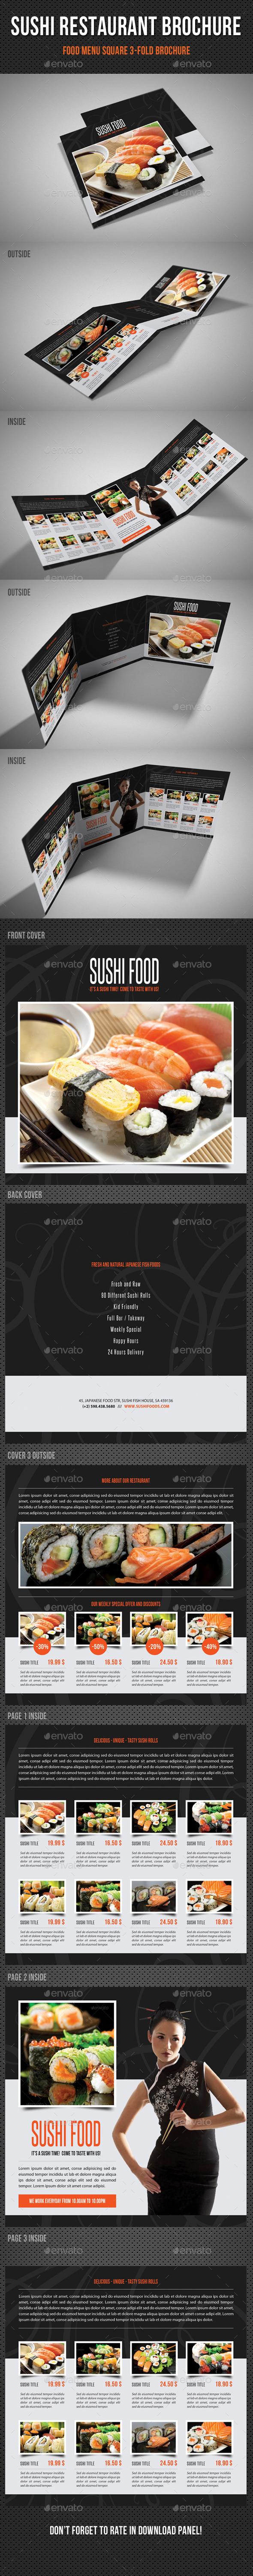 GraphicRiver Sushi Restaurant Menu Square 3-Fold Brochure 01 11290132